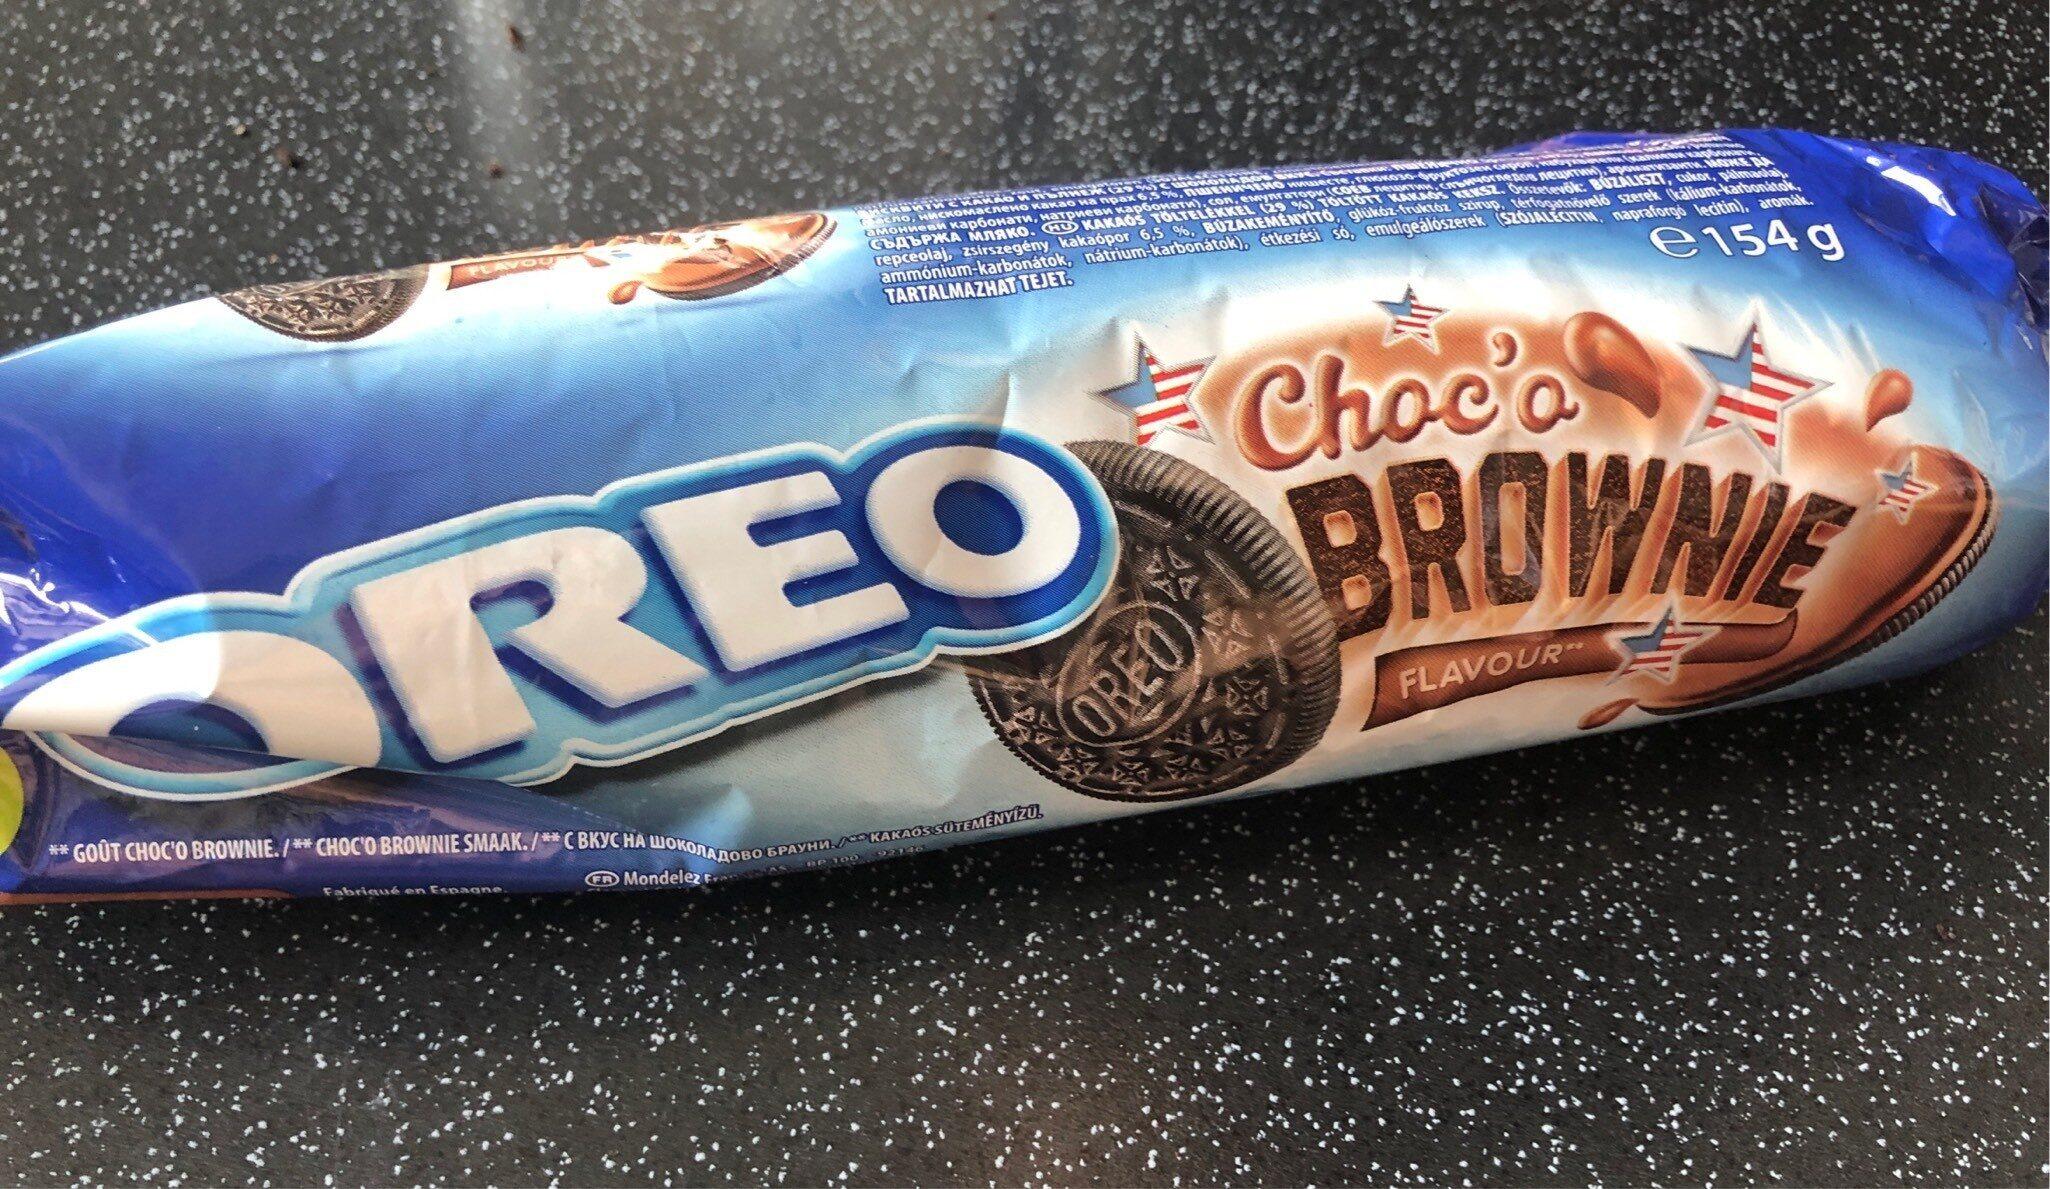 Oreo Choco Brownie - Produit - fr